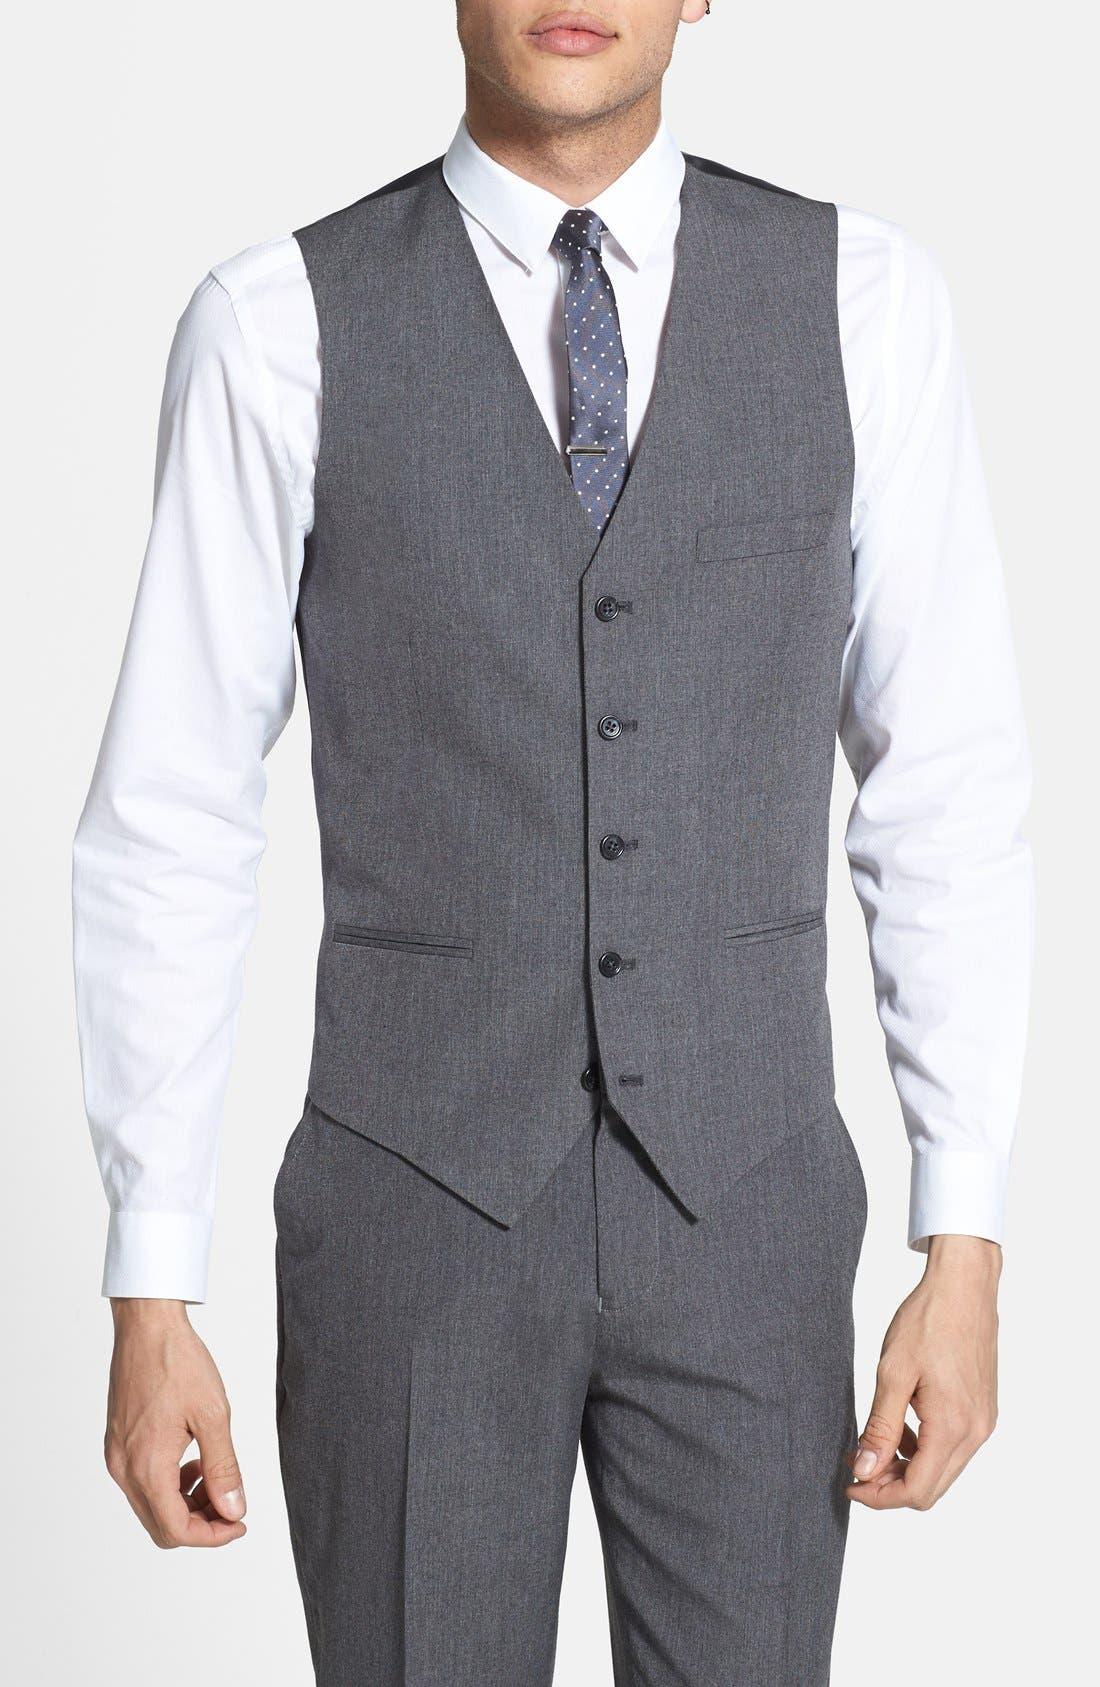 Main Image - Topman Skinny Fit Grey Vest